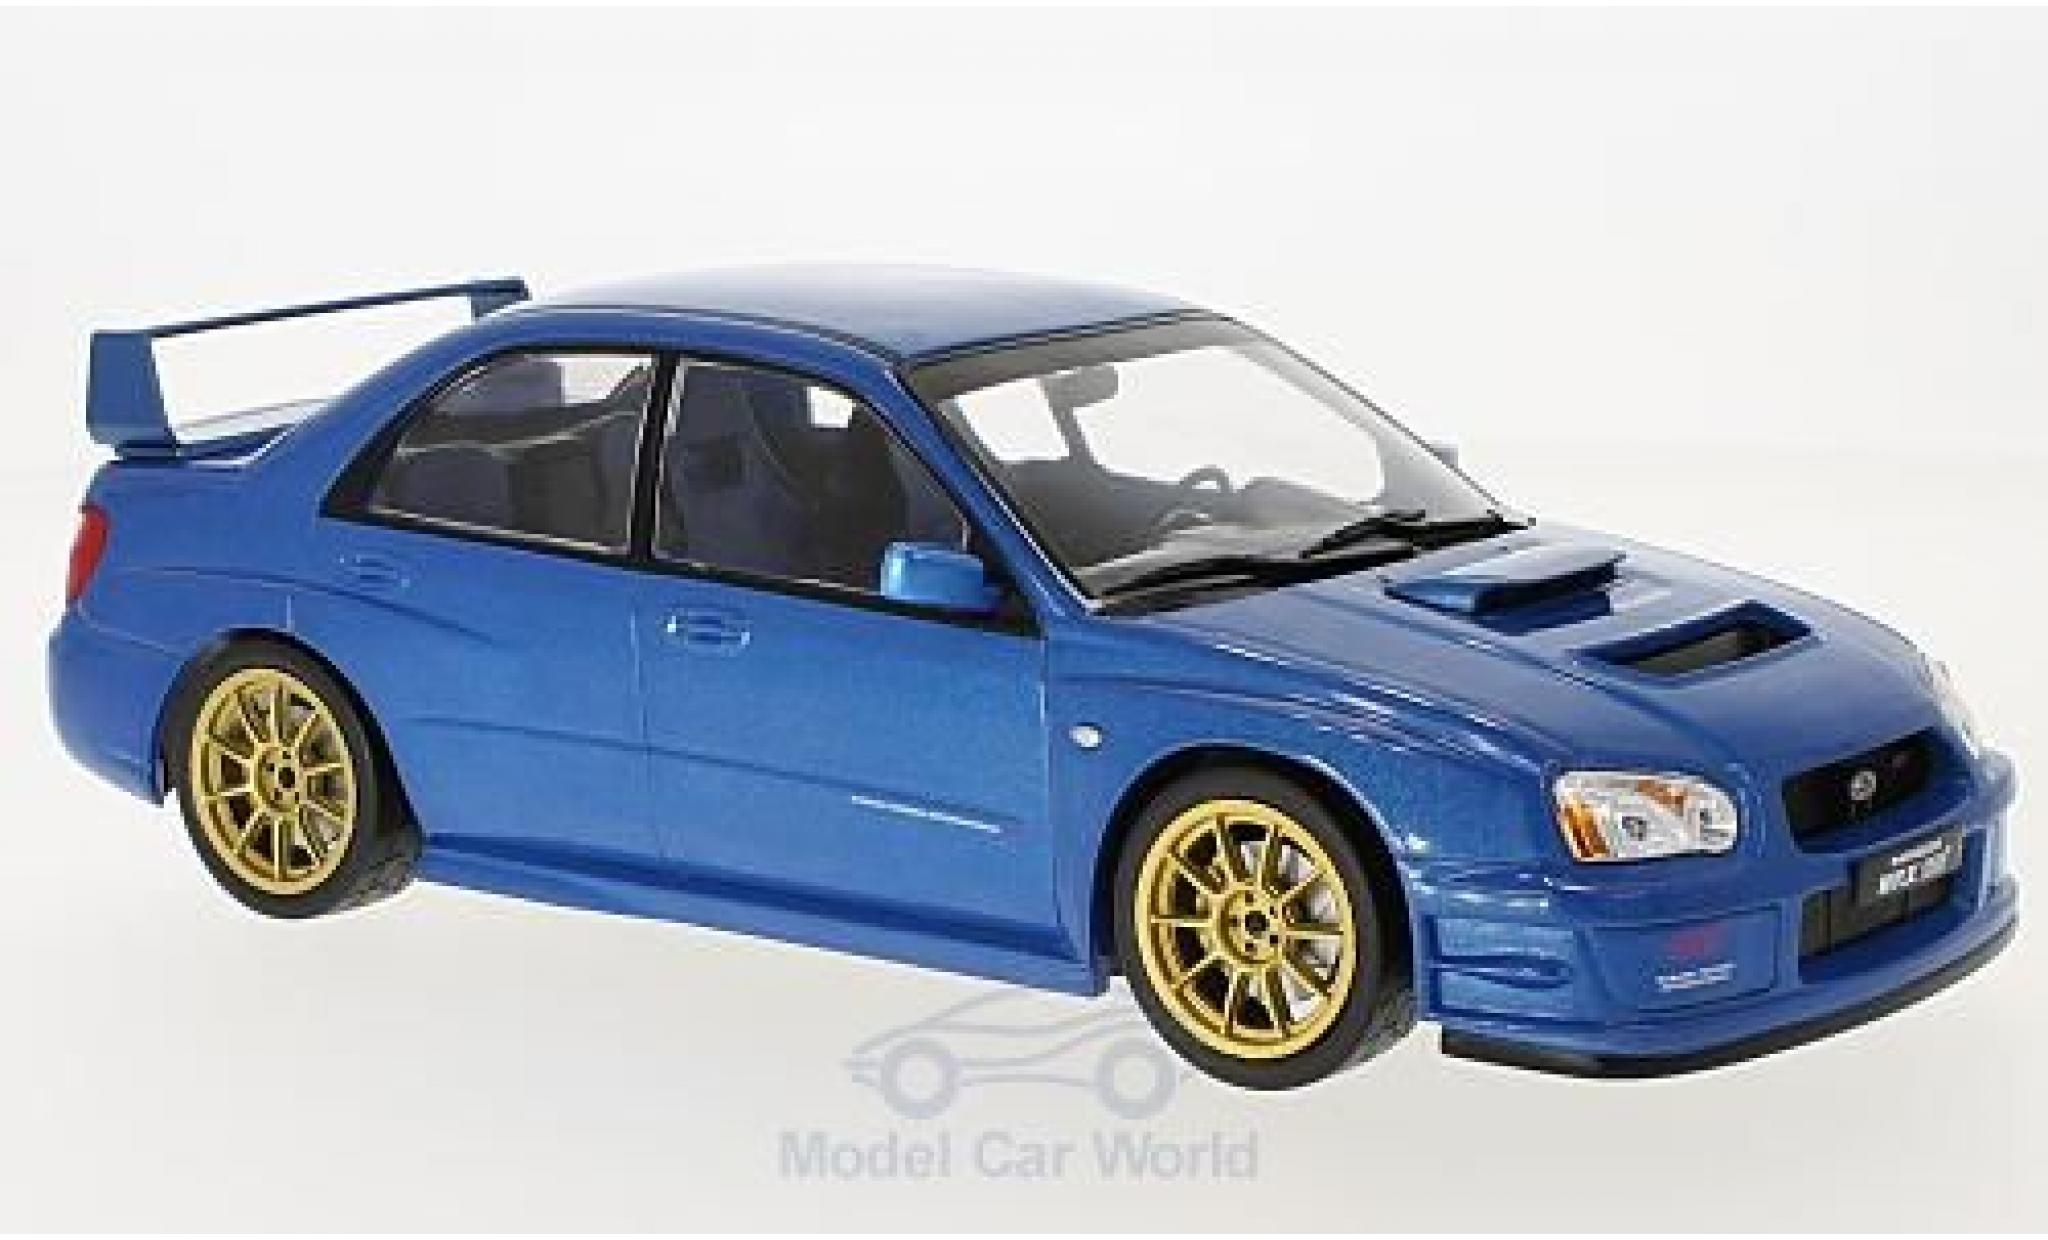 Subaru Impreza STI 1/18 IXO WRX STI metallic-blue 2003